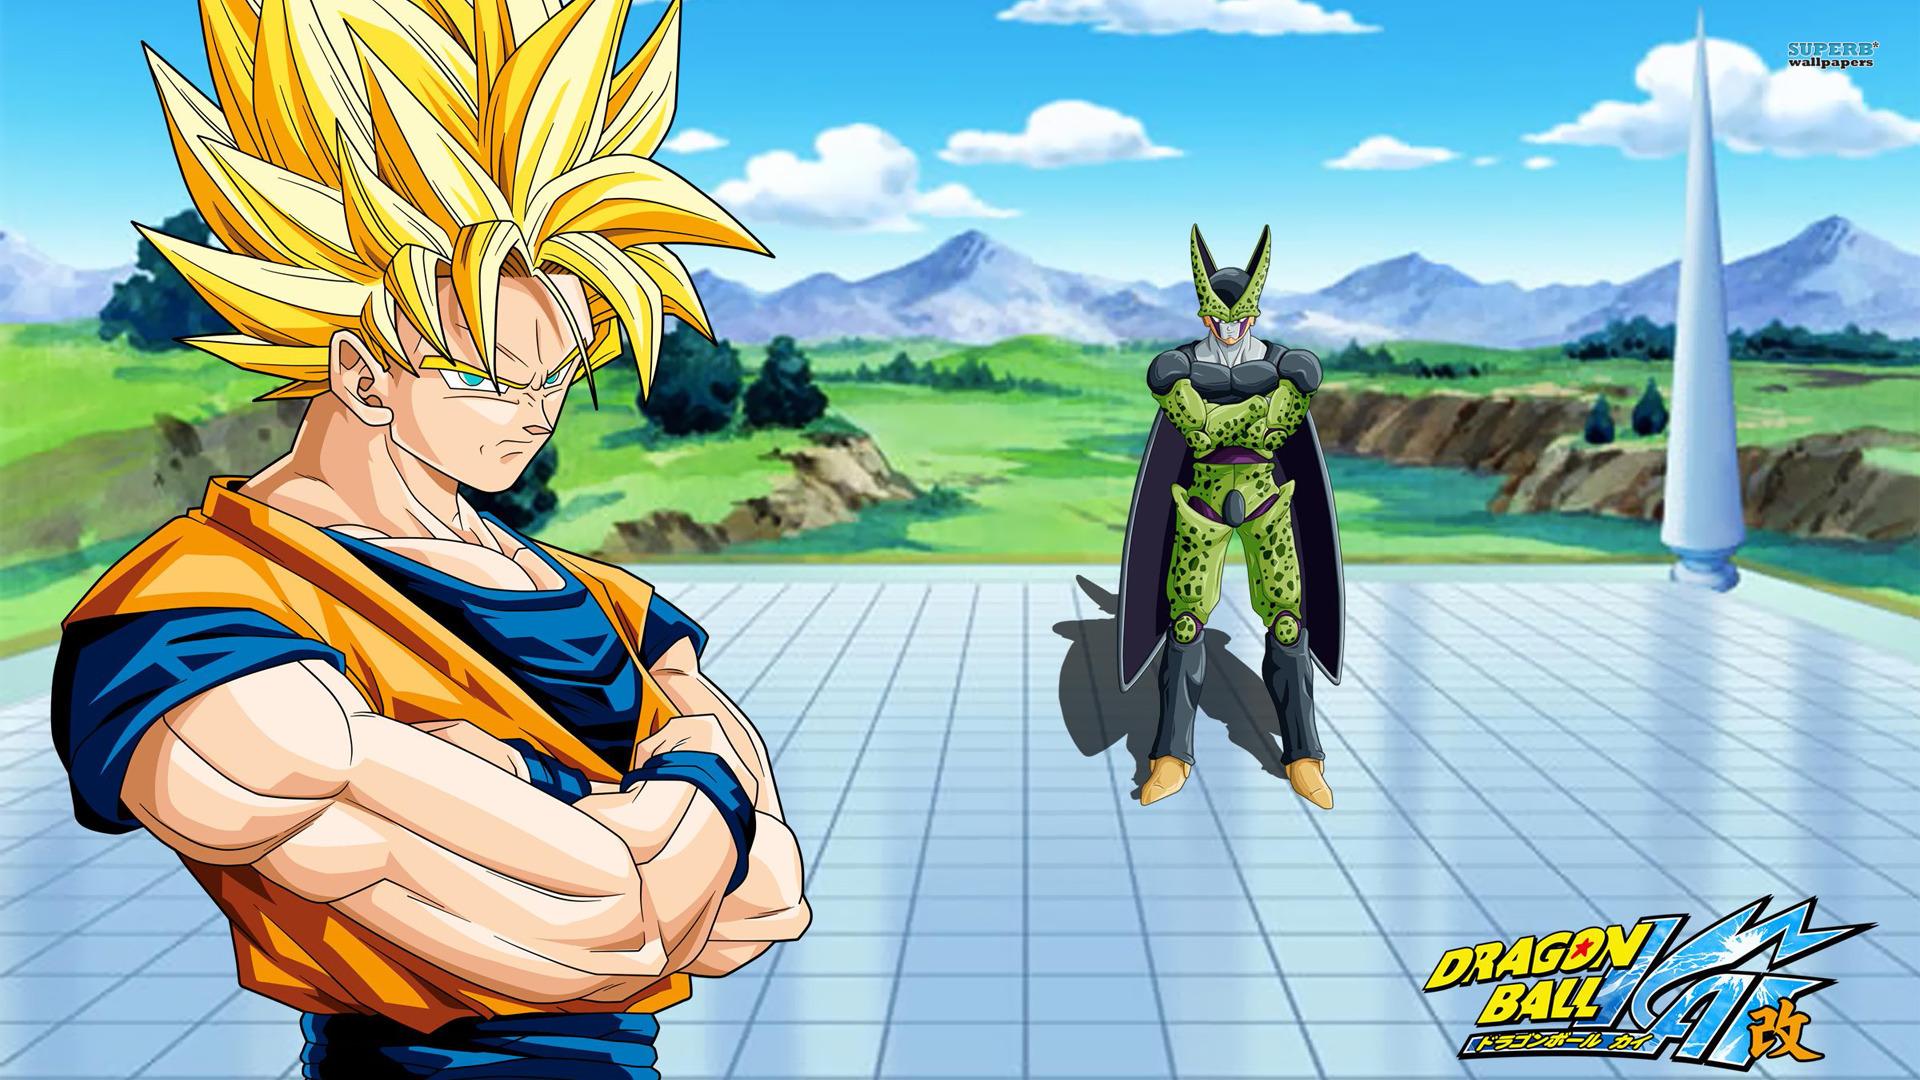 Free Download De Pantalla Goku Vs Cell Hd 1920x1080 Dibujos